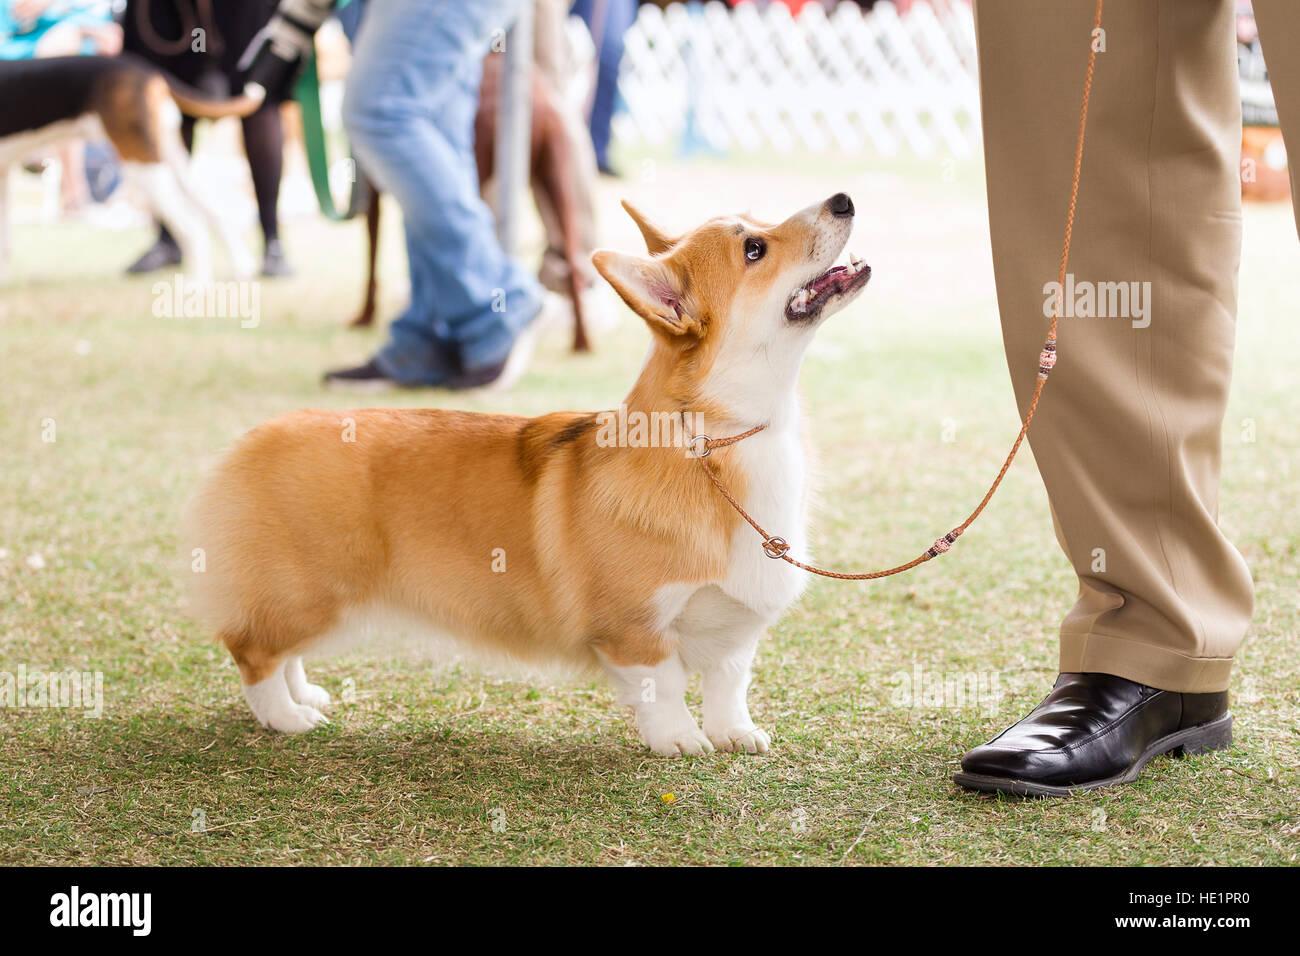 Pembroke Welsh Corgi at a dog show - Stock Image